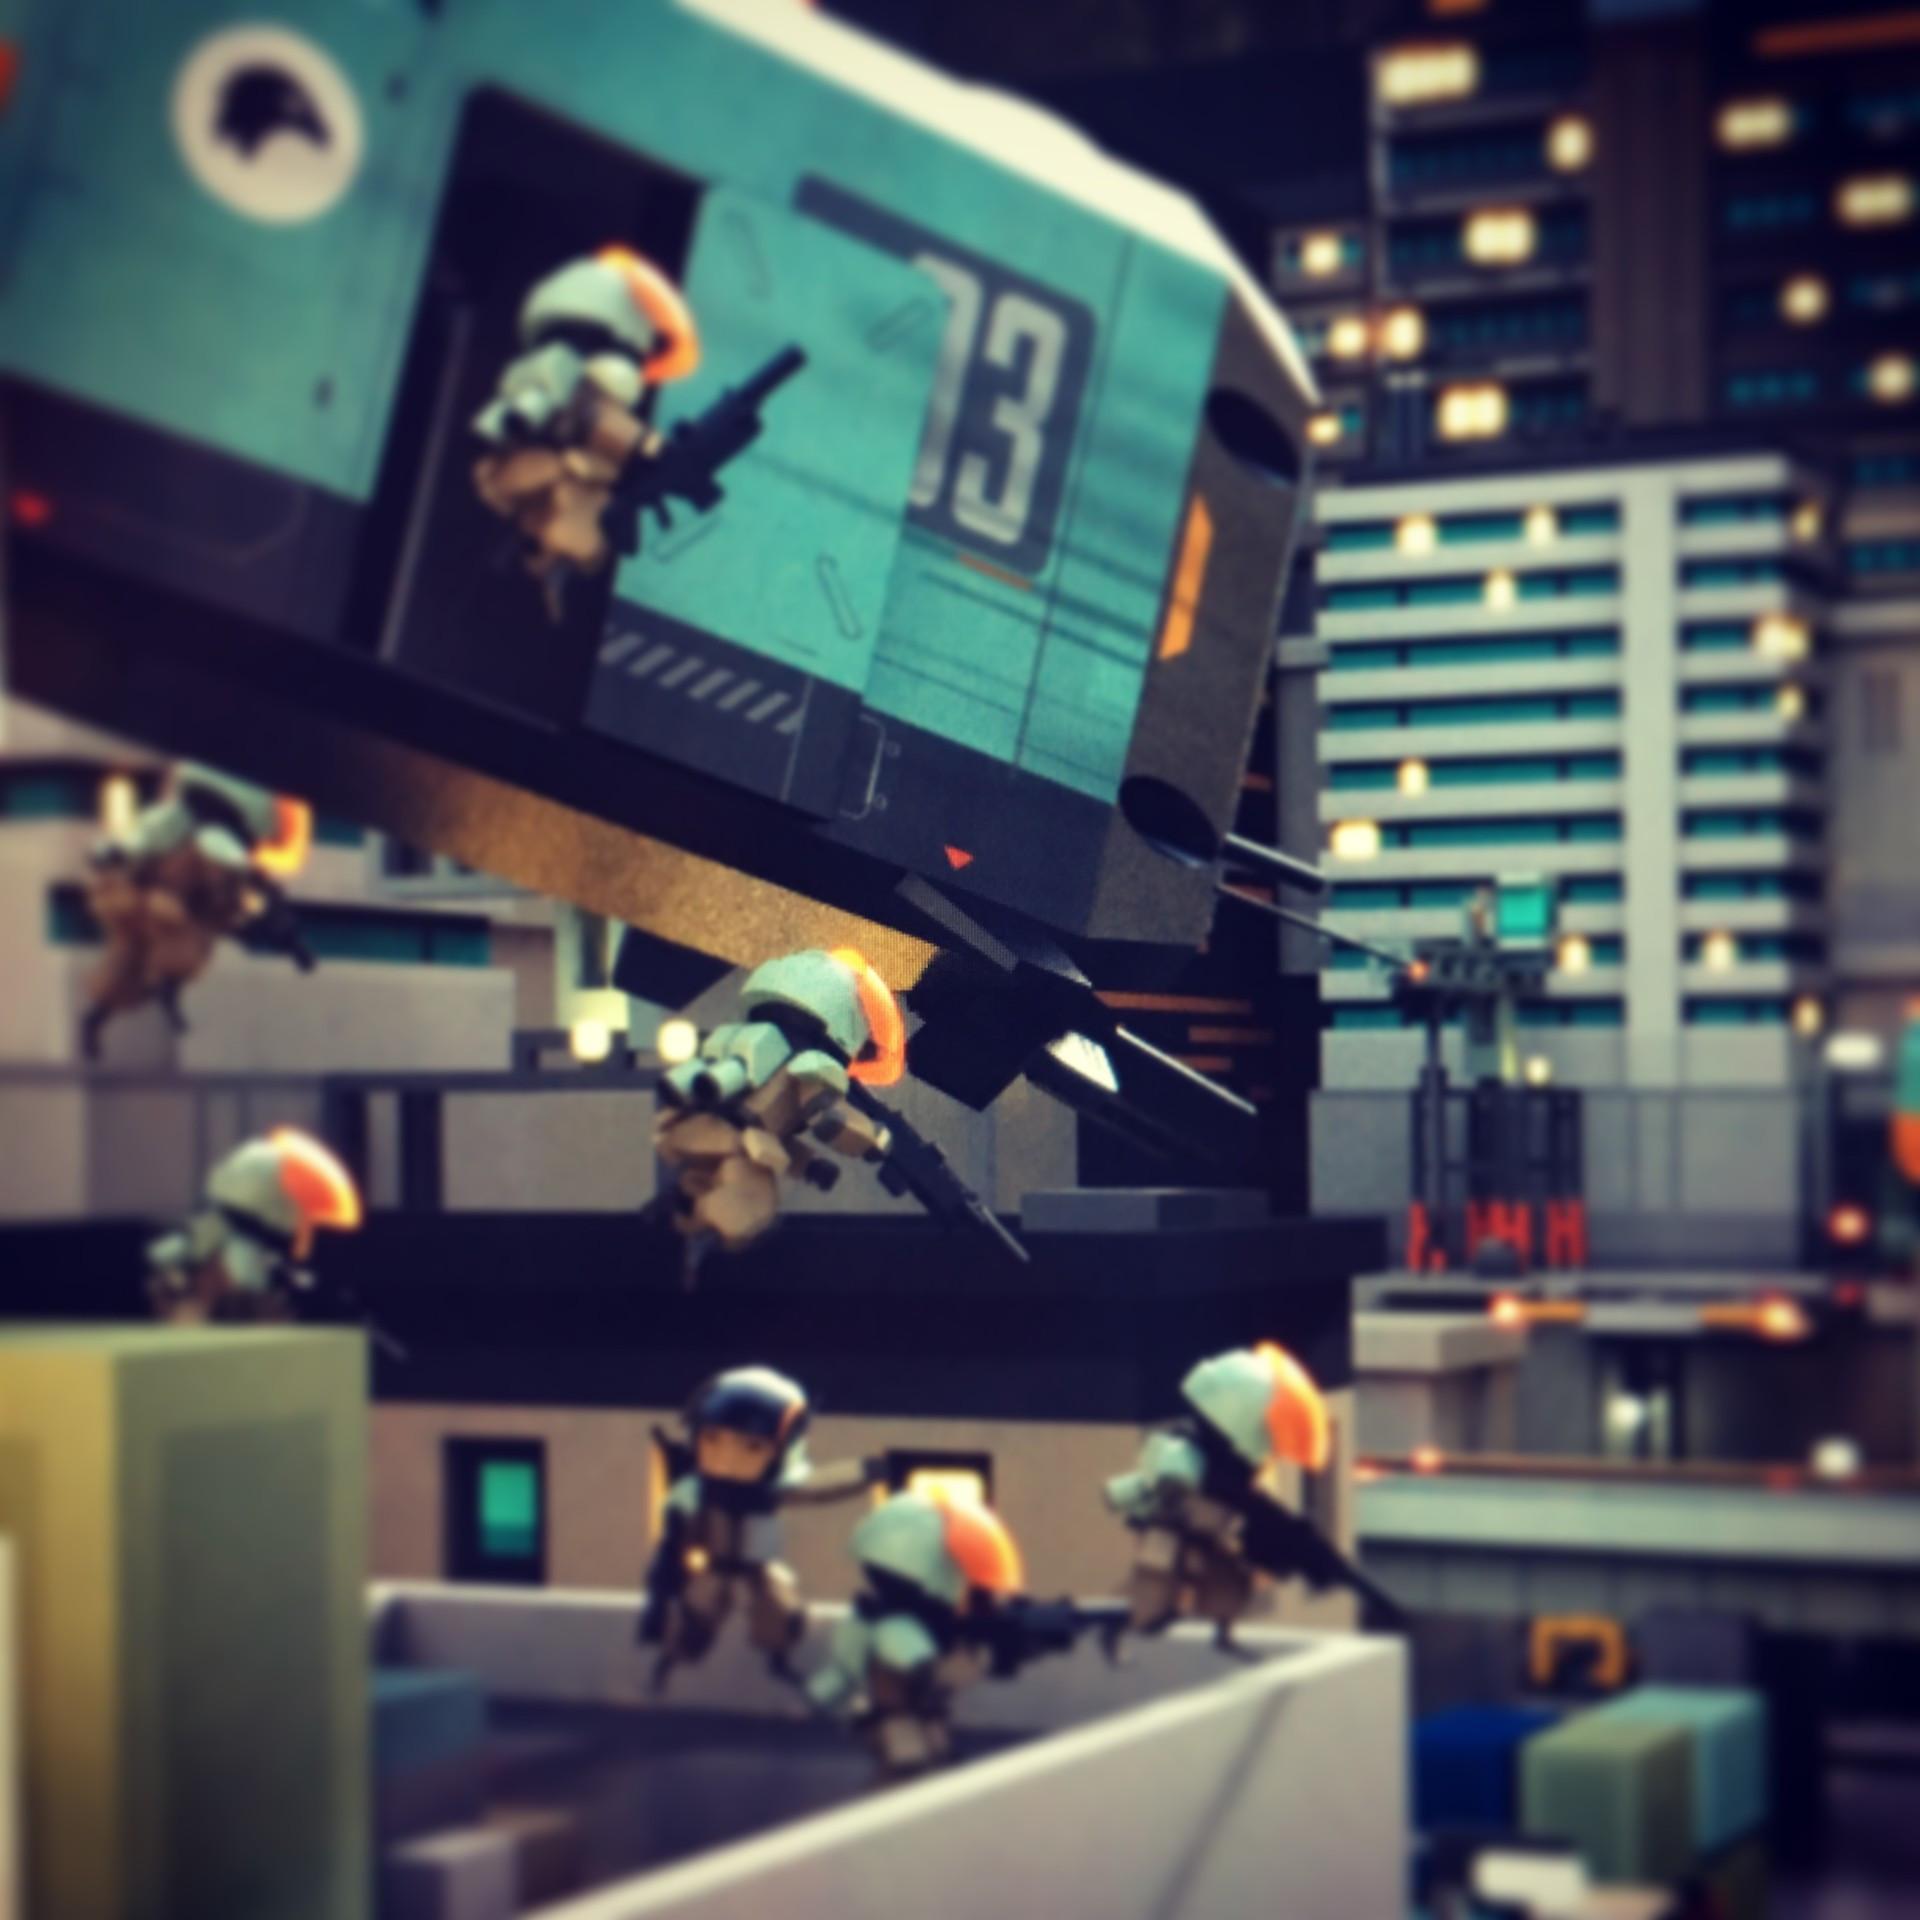 CityDrop_02.jpg